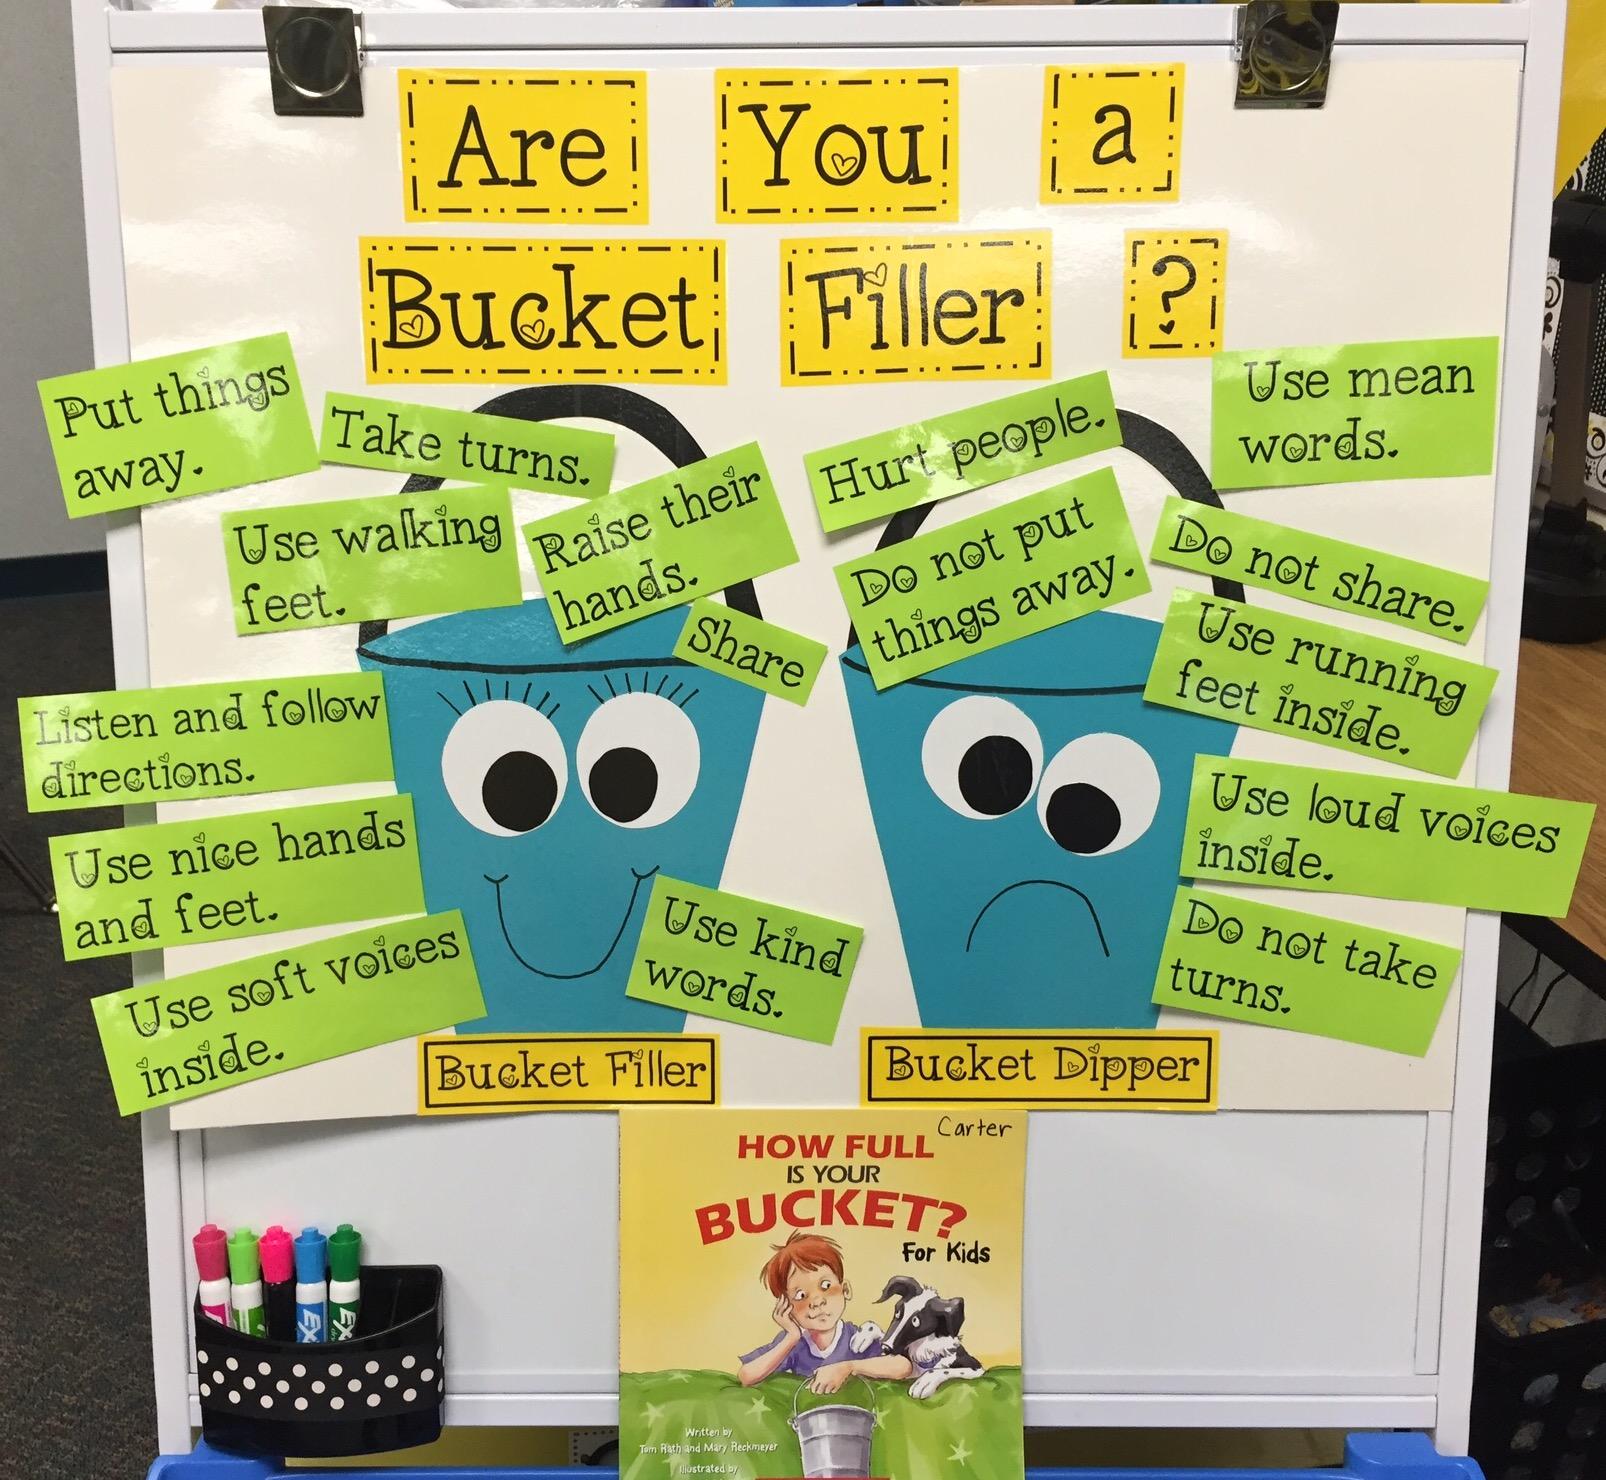 scholastic preschool creating a culture of kindness in your classroom scholastic 743